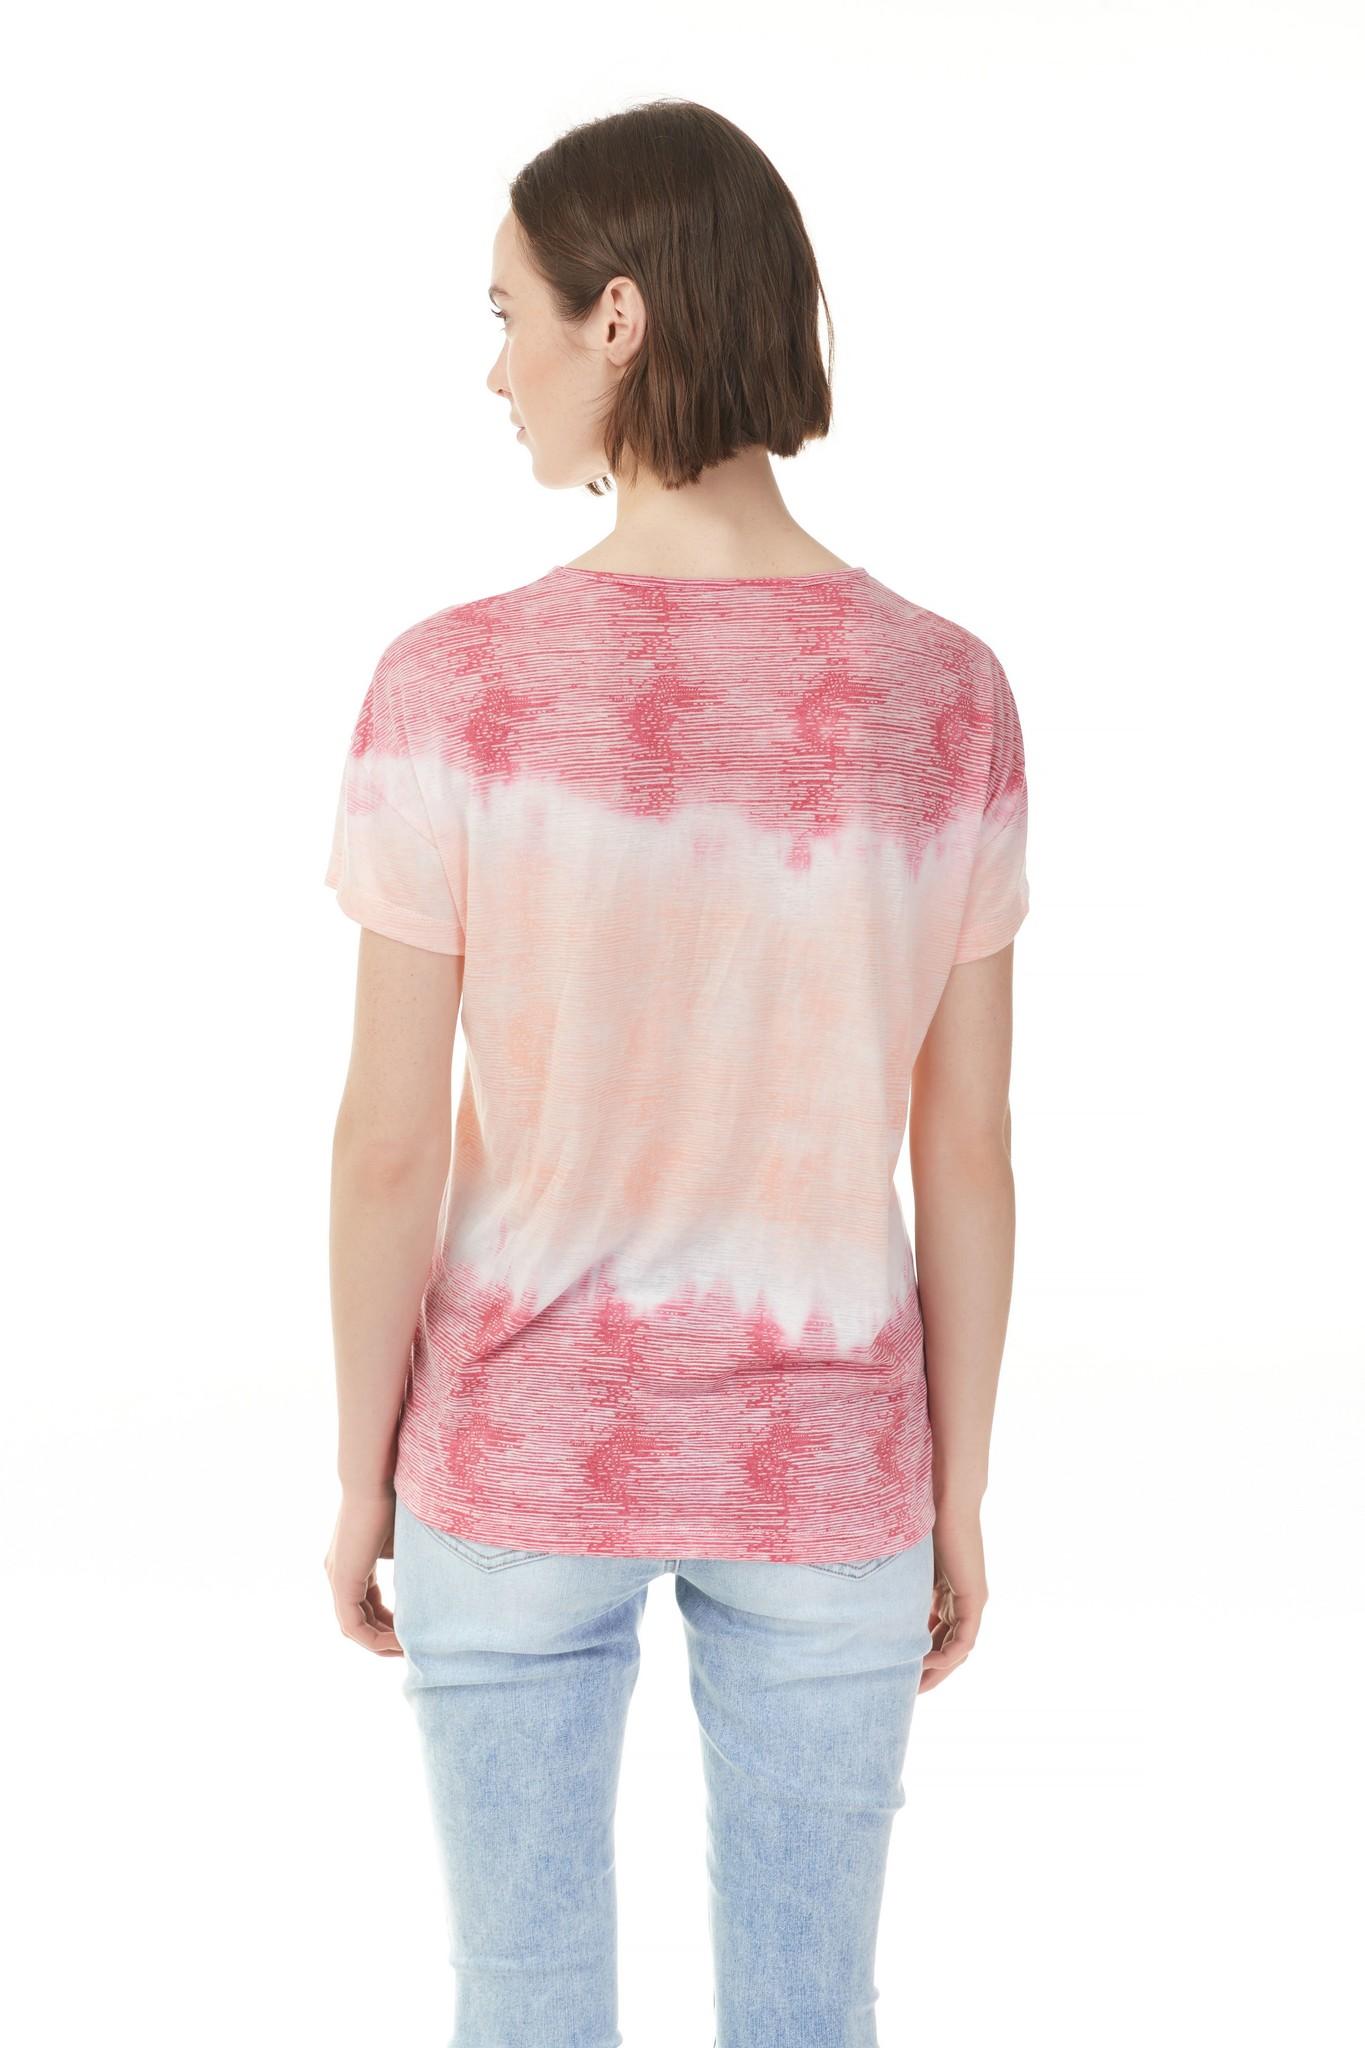 Charlie B Charlie B Burnout Top - Flamingo